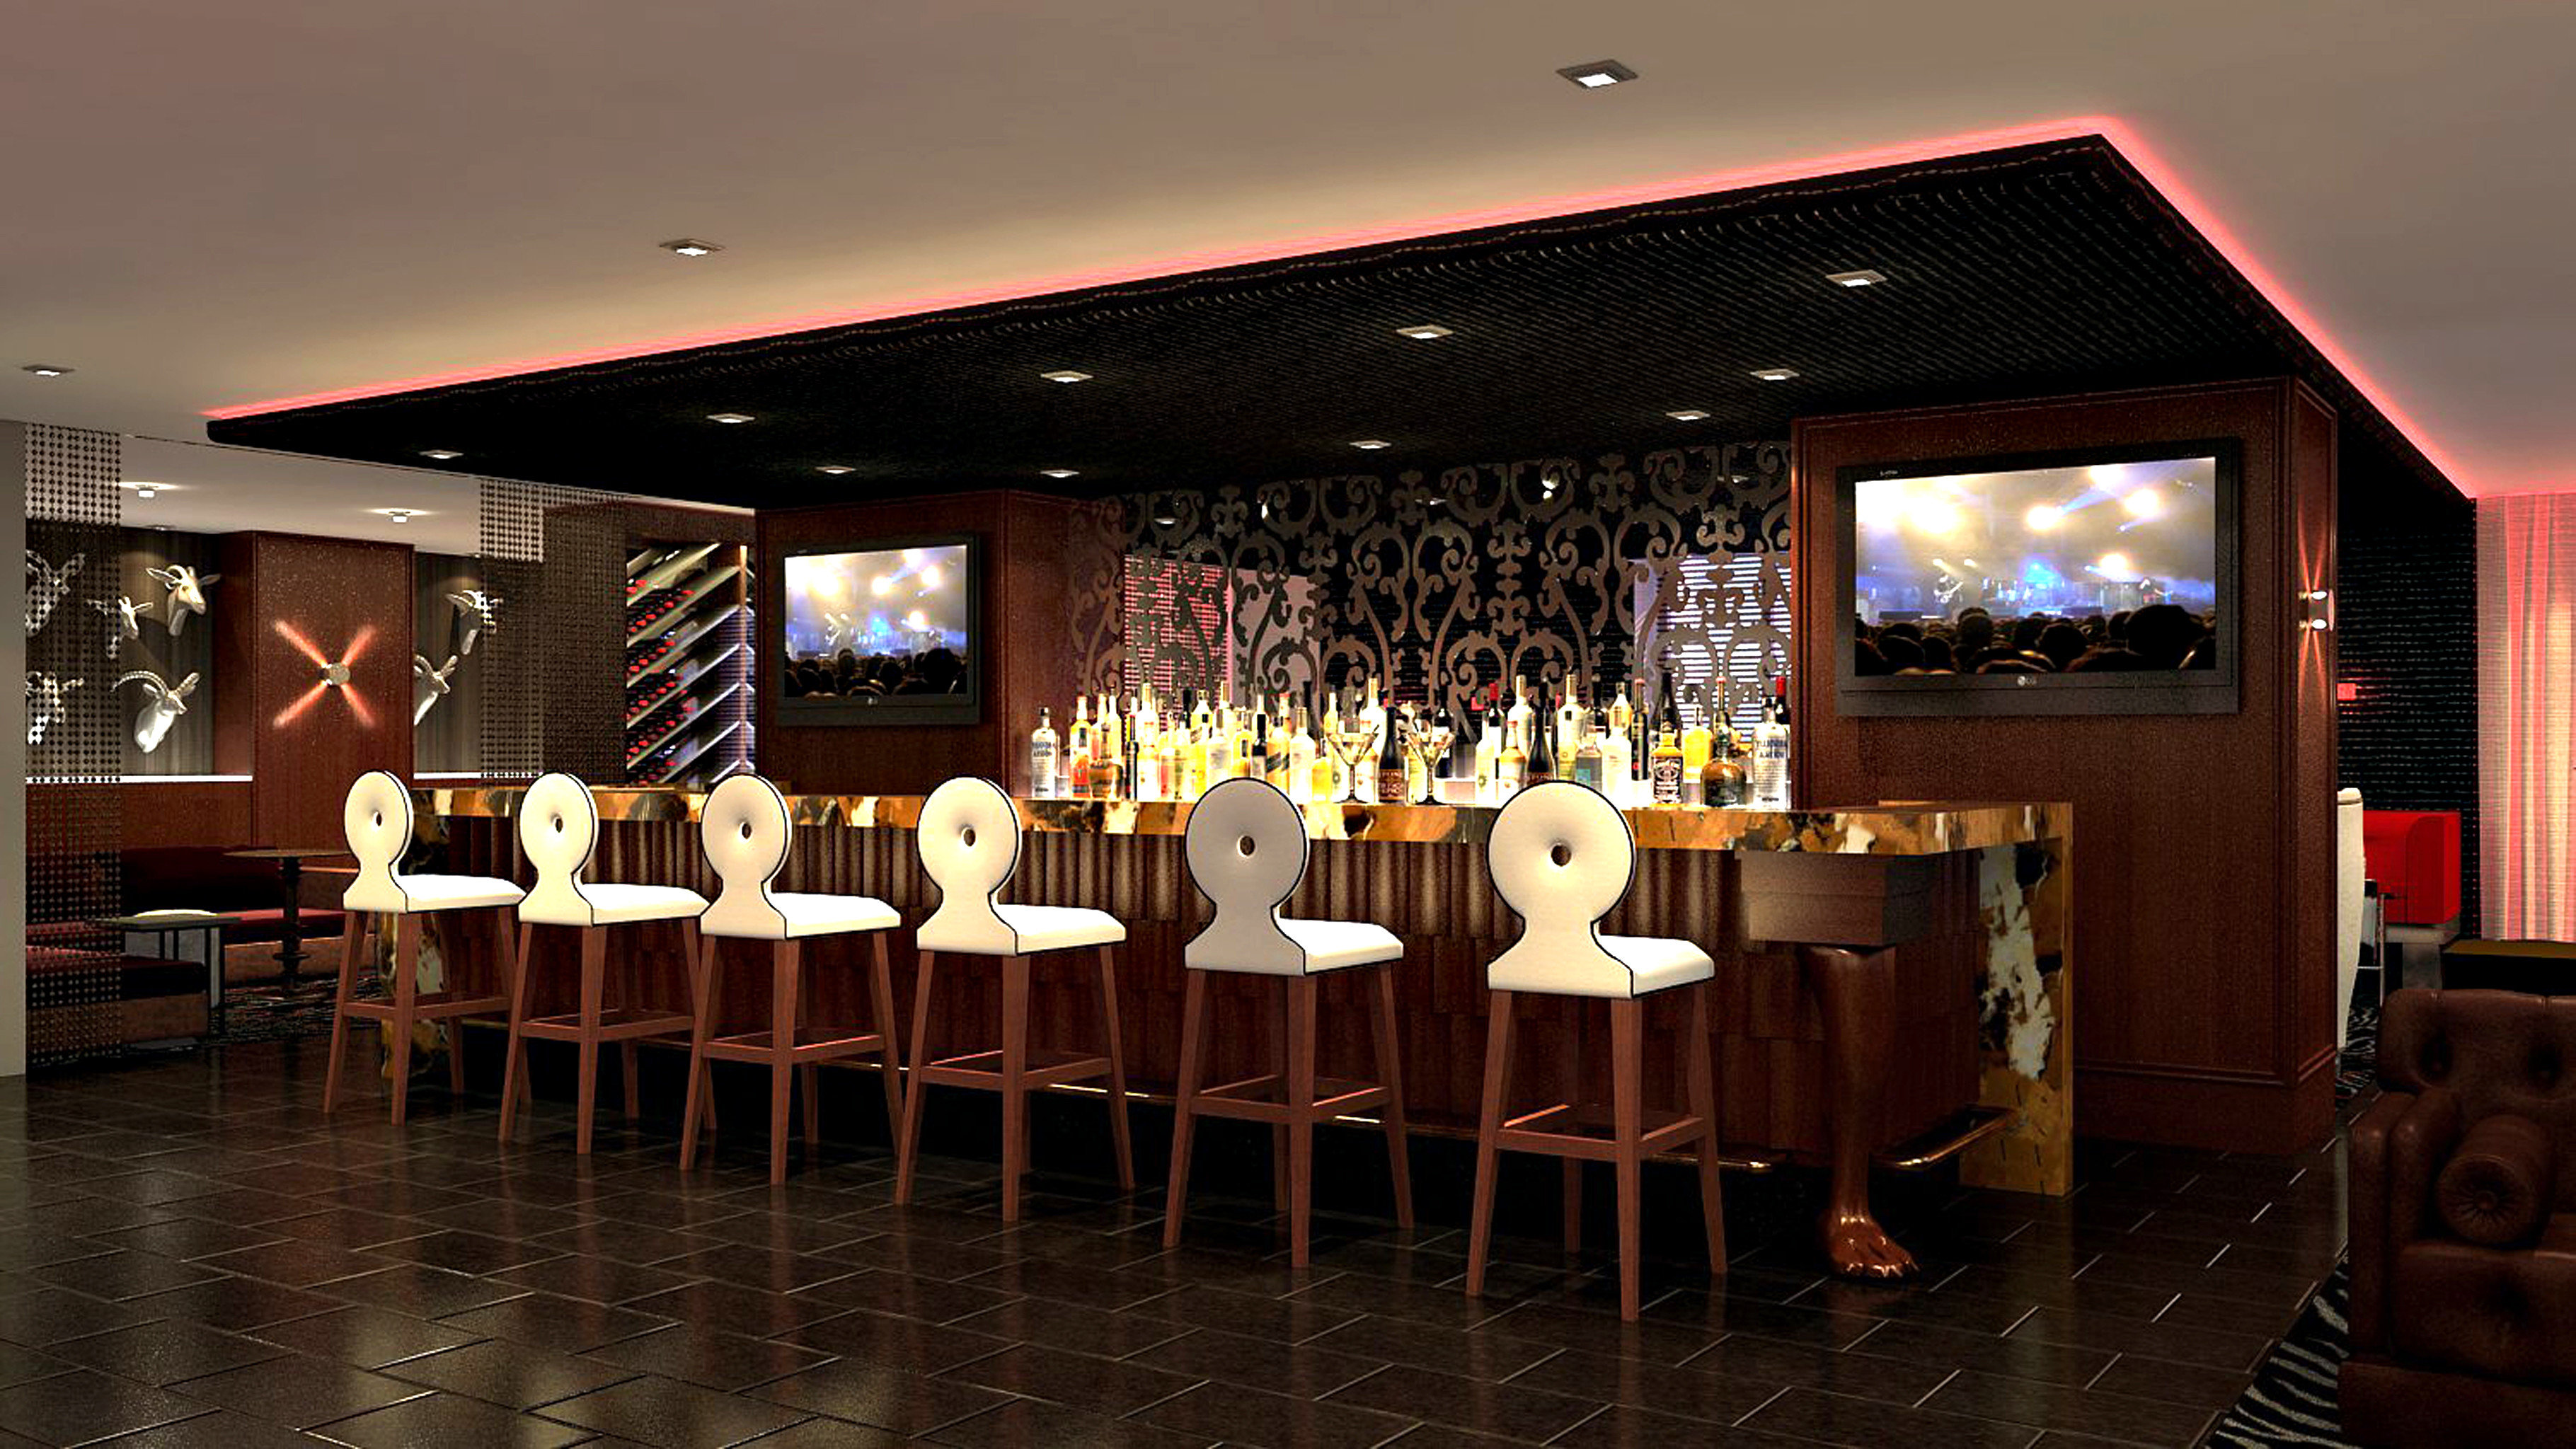 Bar City Drink Modern restaurant function hall ballroom